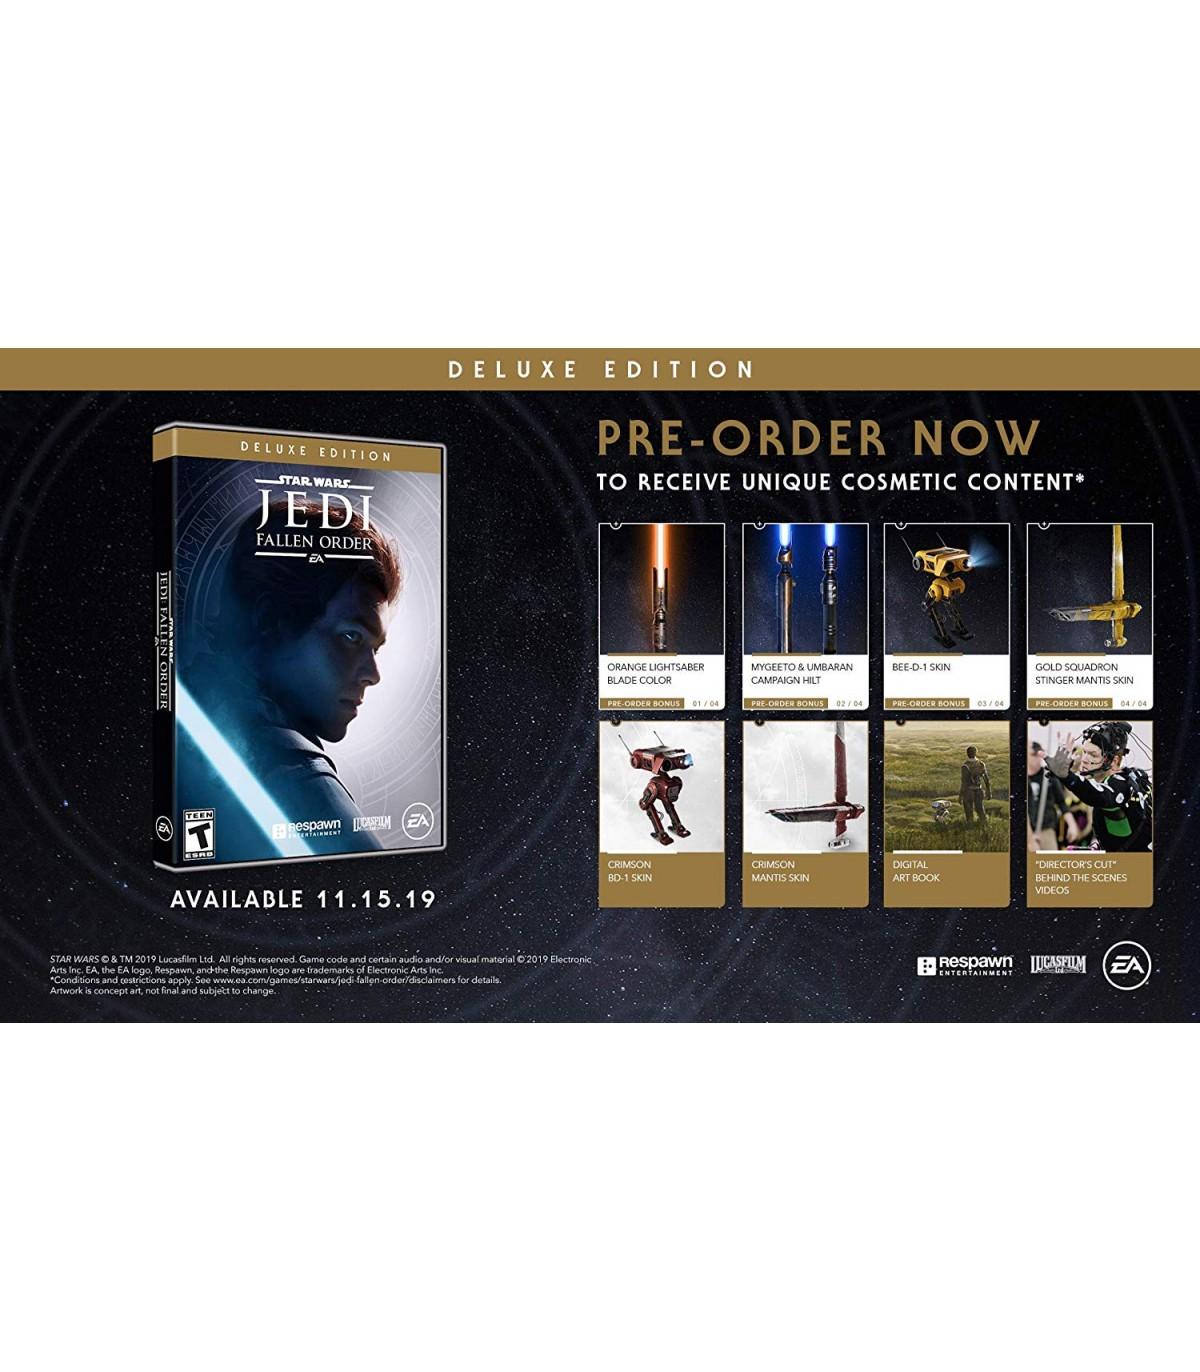 بازی Star Wars Jedi: Fallen Order Deluxe Edition - پلی استیشن 4